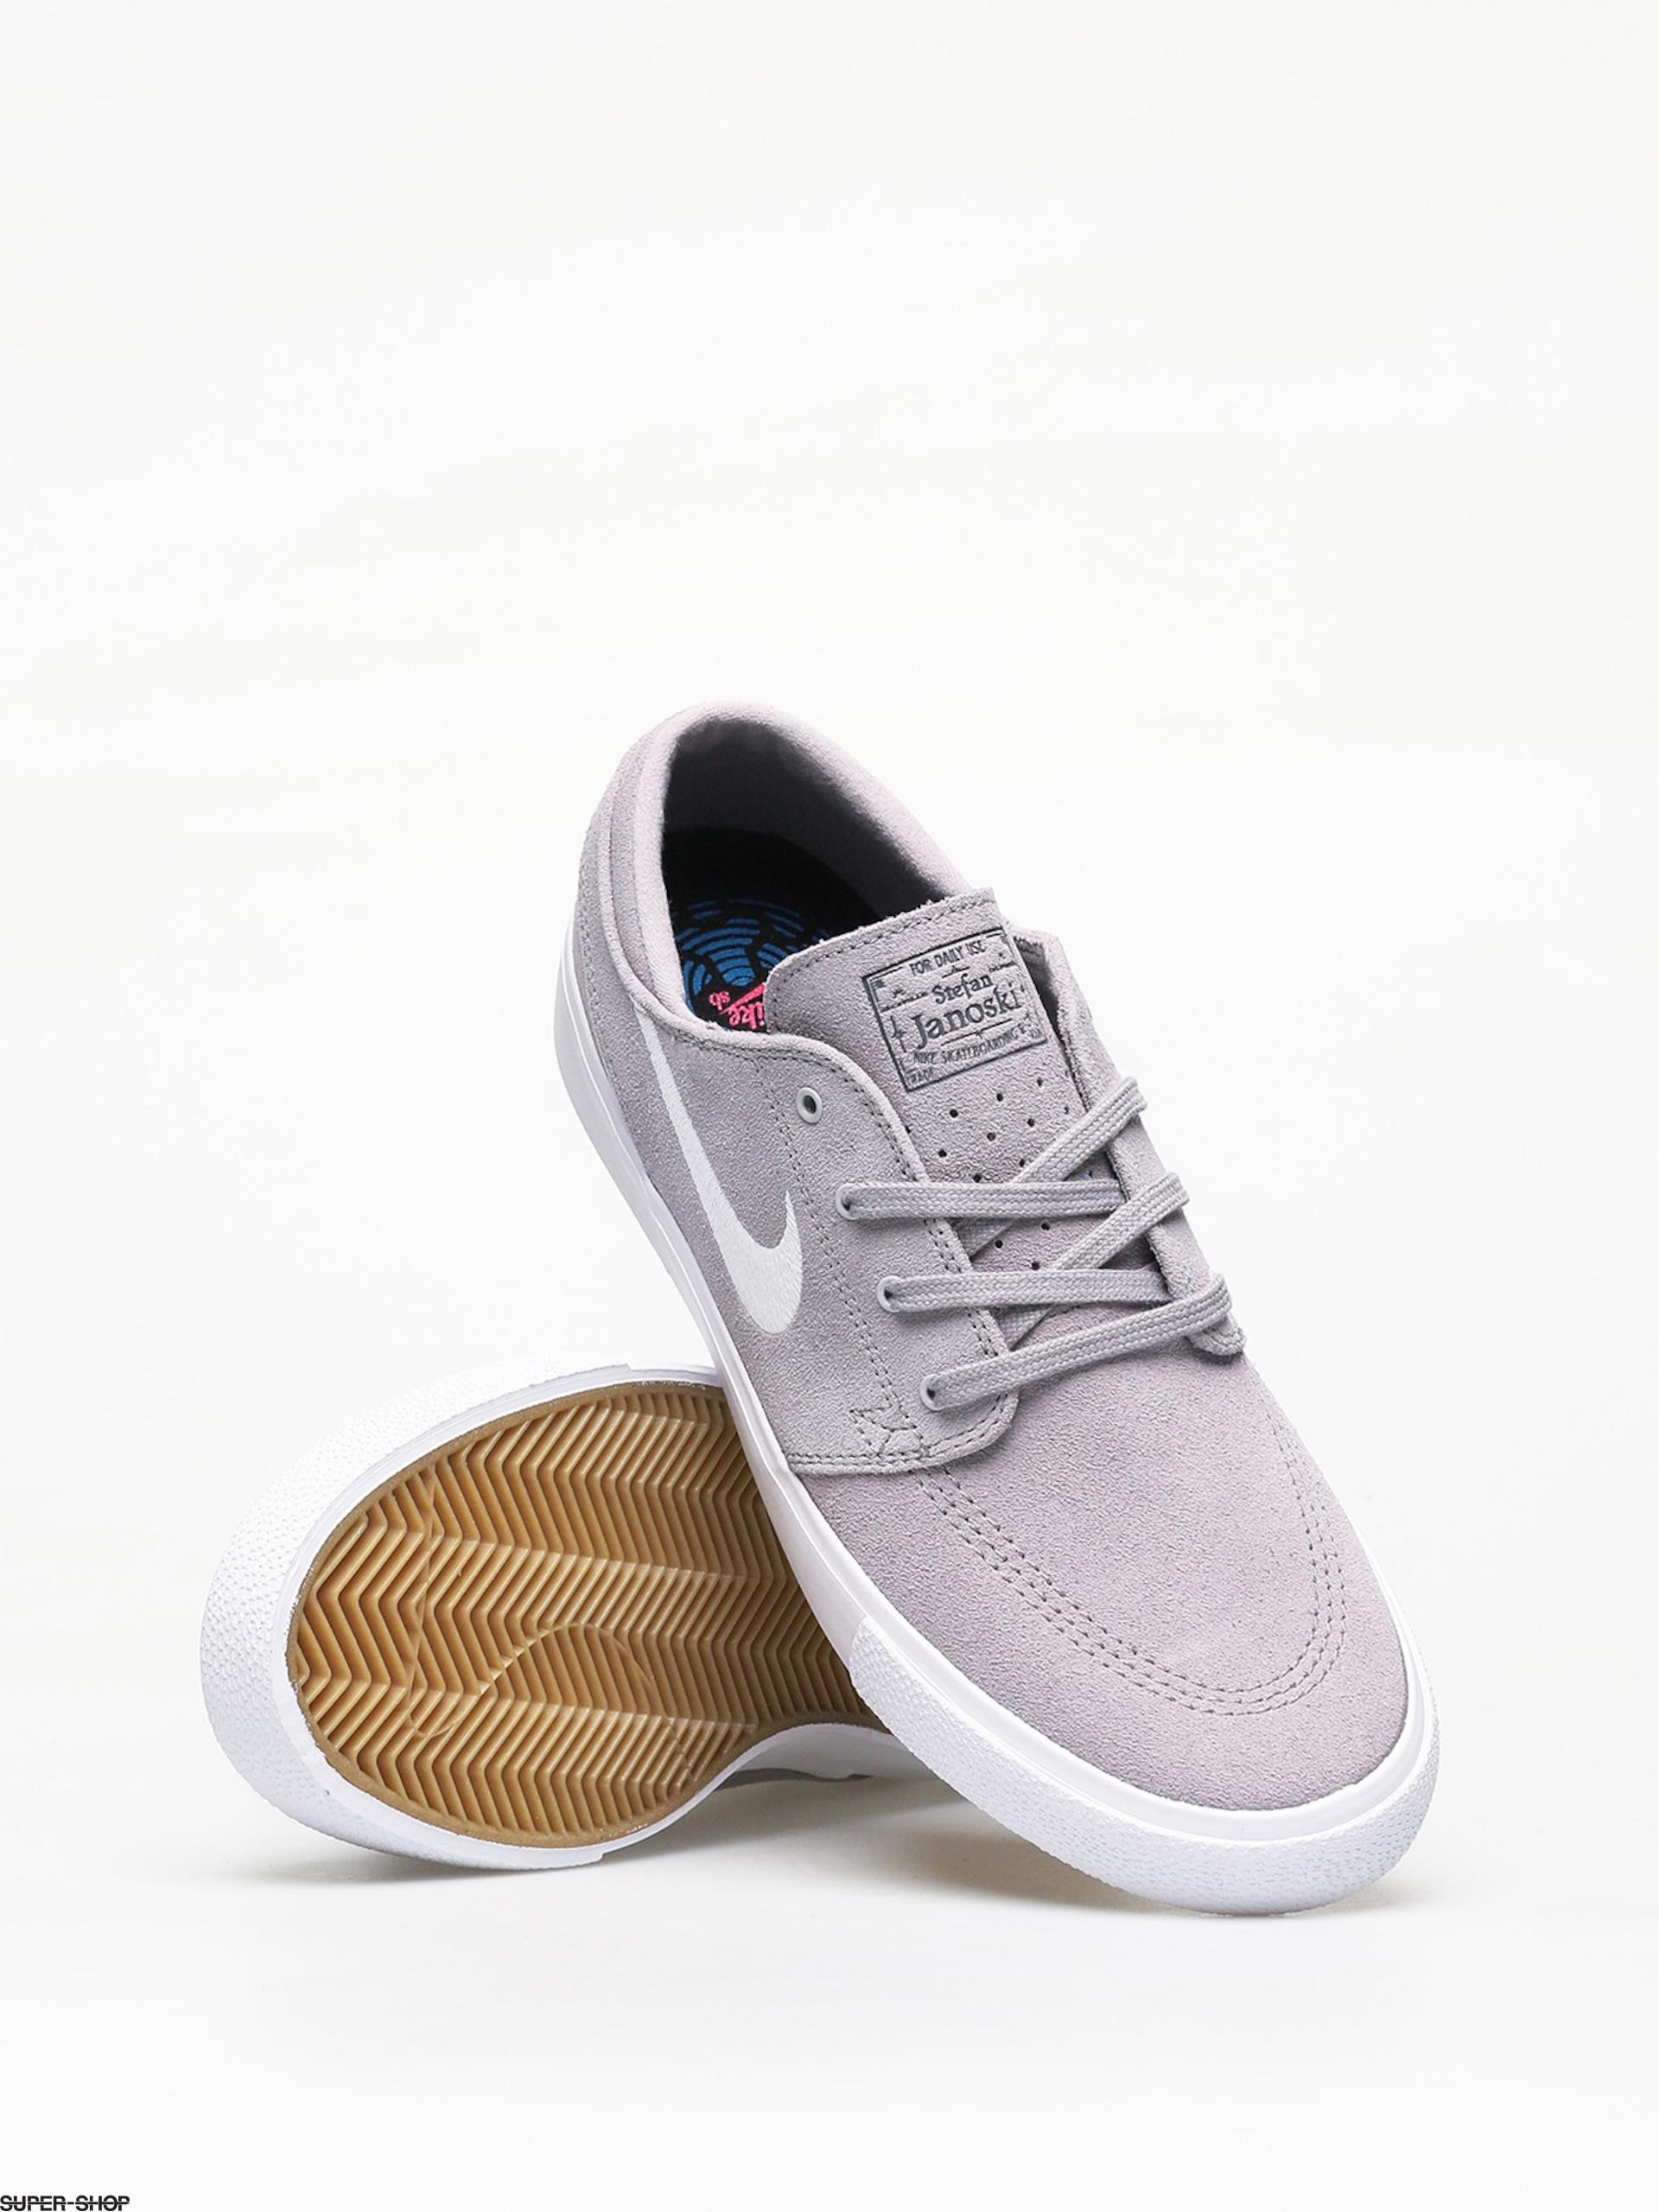 outlet store 79efa 47421 Nike SB Zoom Janoski Rm Shoes (atmosphere grey white dark grey)